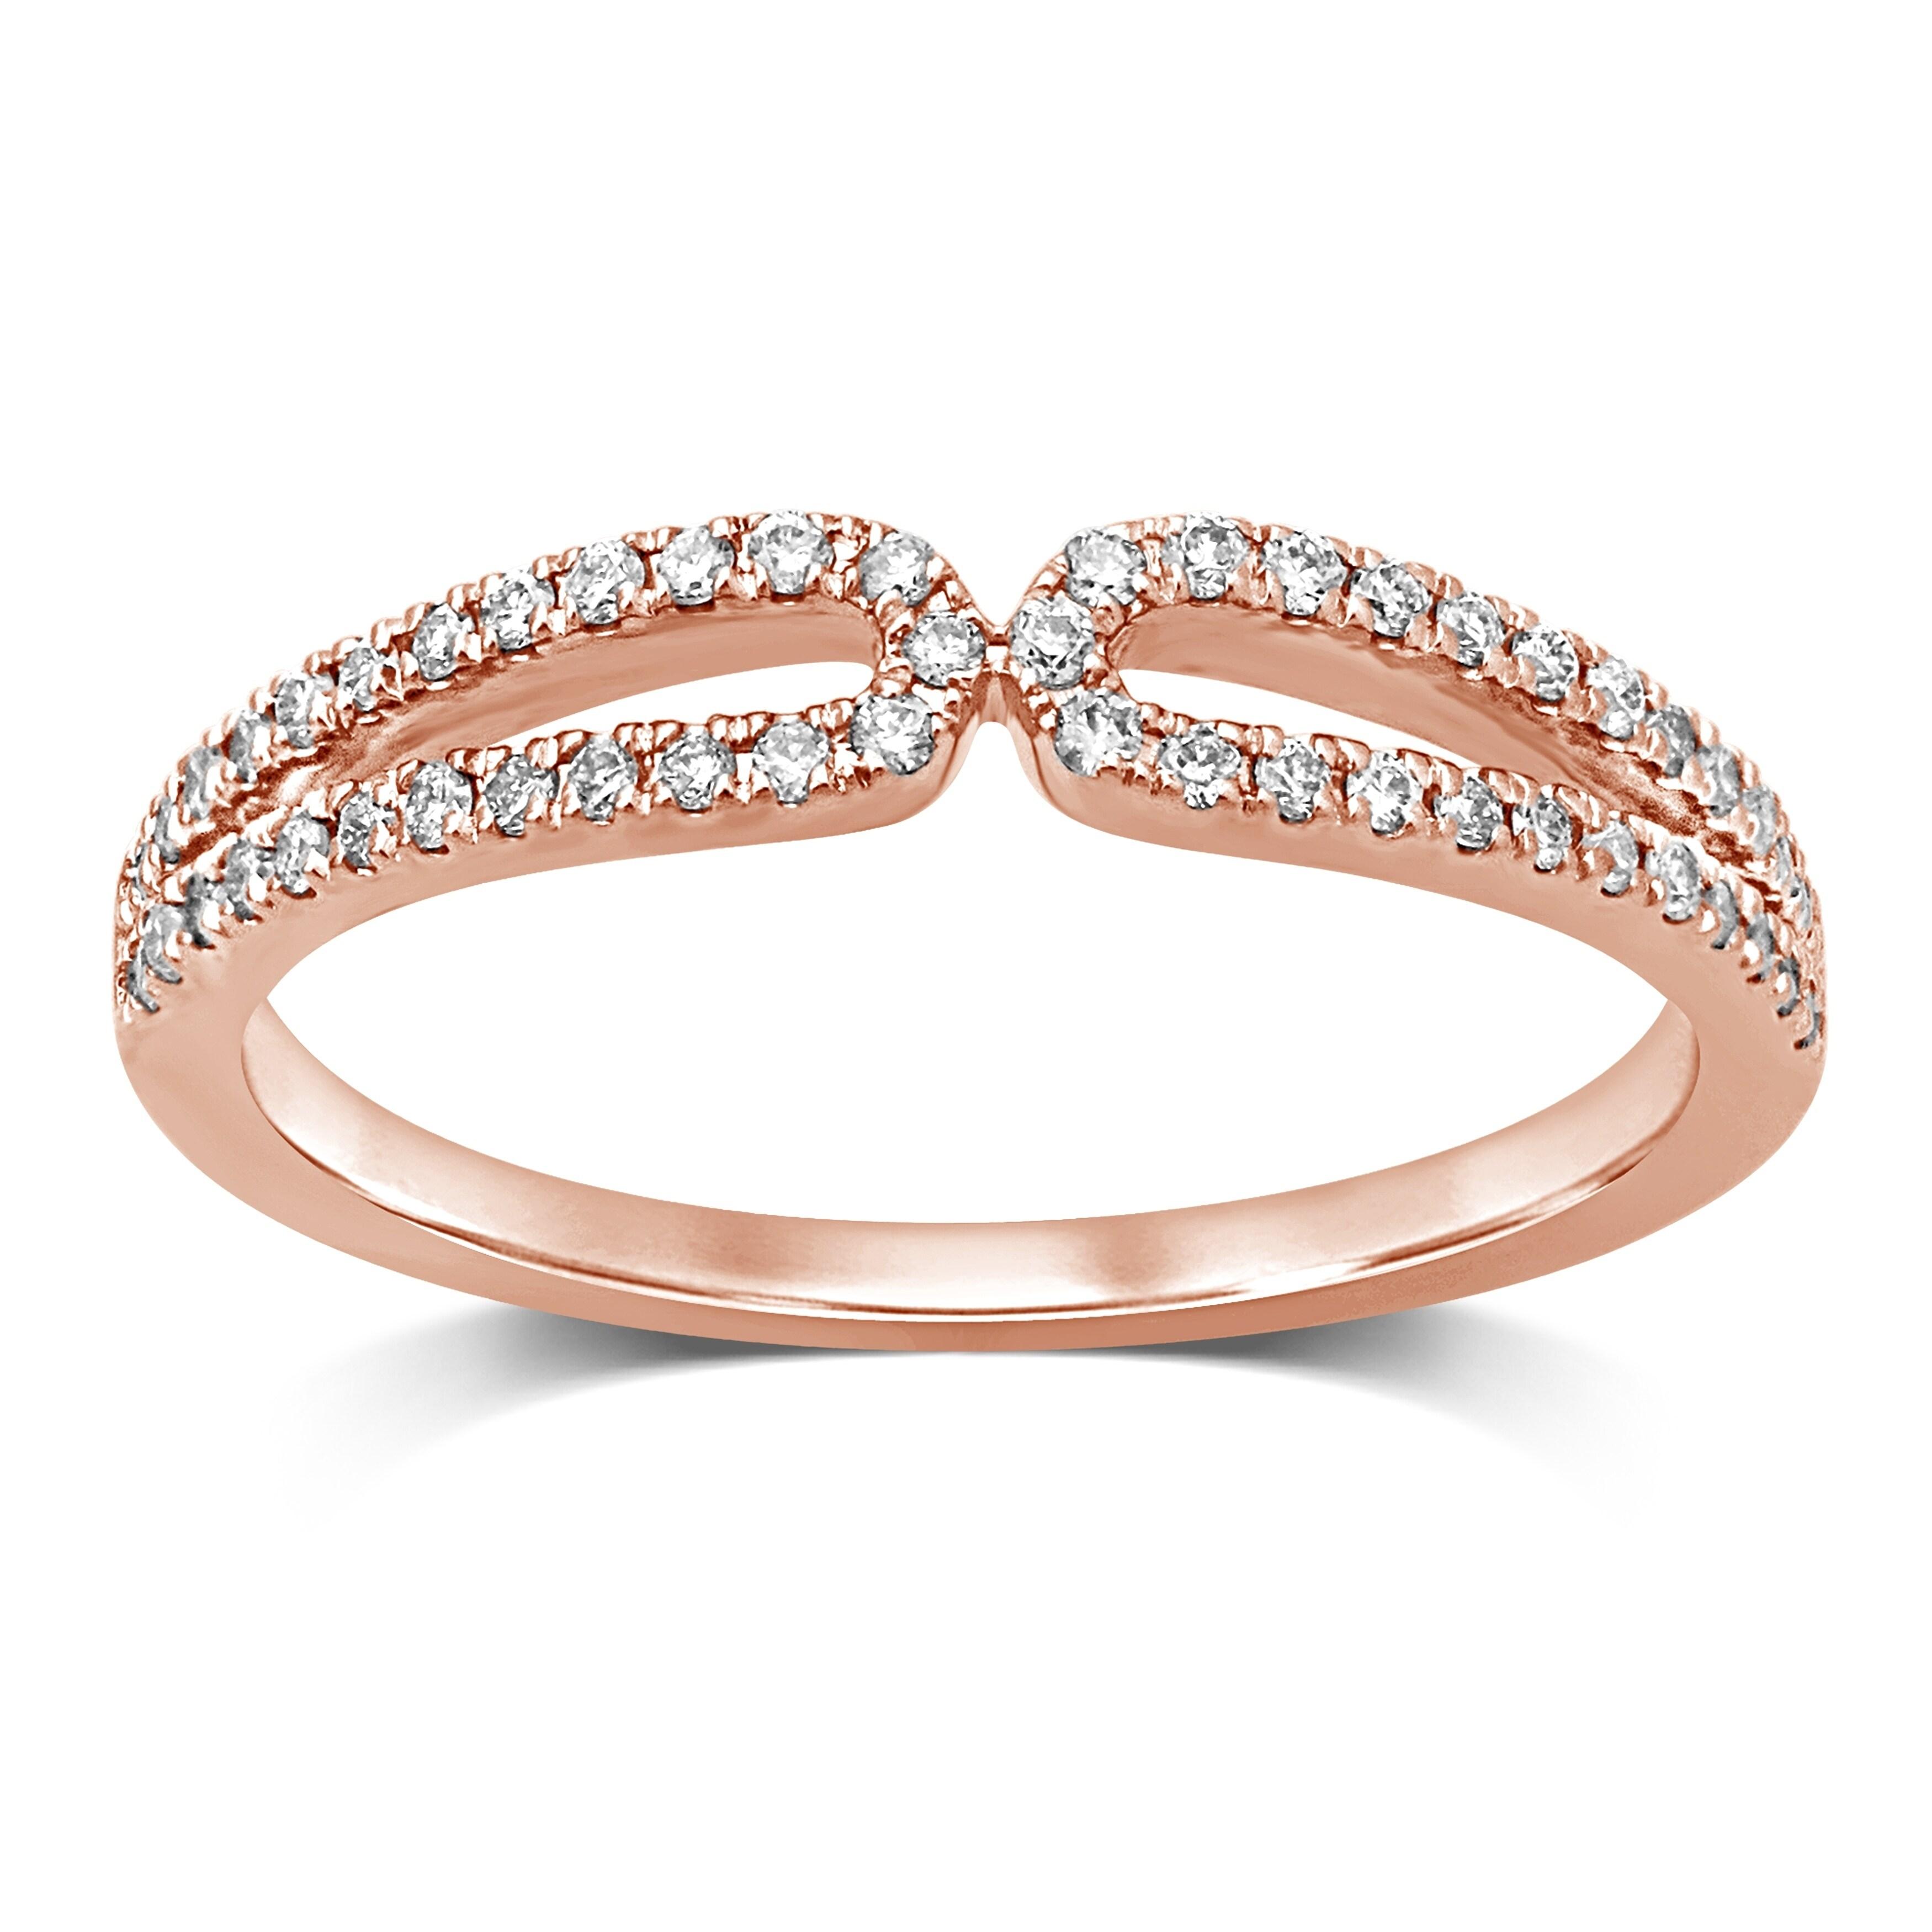 Shop Unending Love 10k Gold 1 4 Cttw White Diamond Wedding Fashion